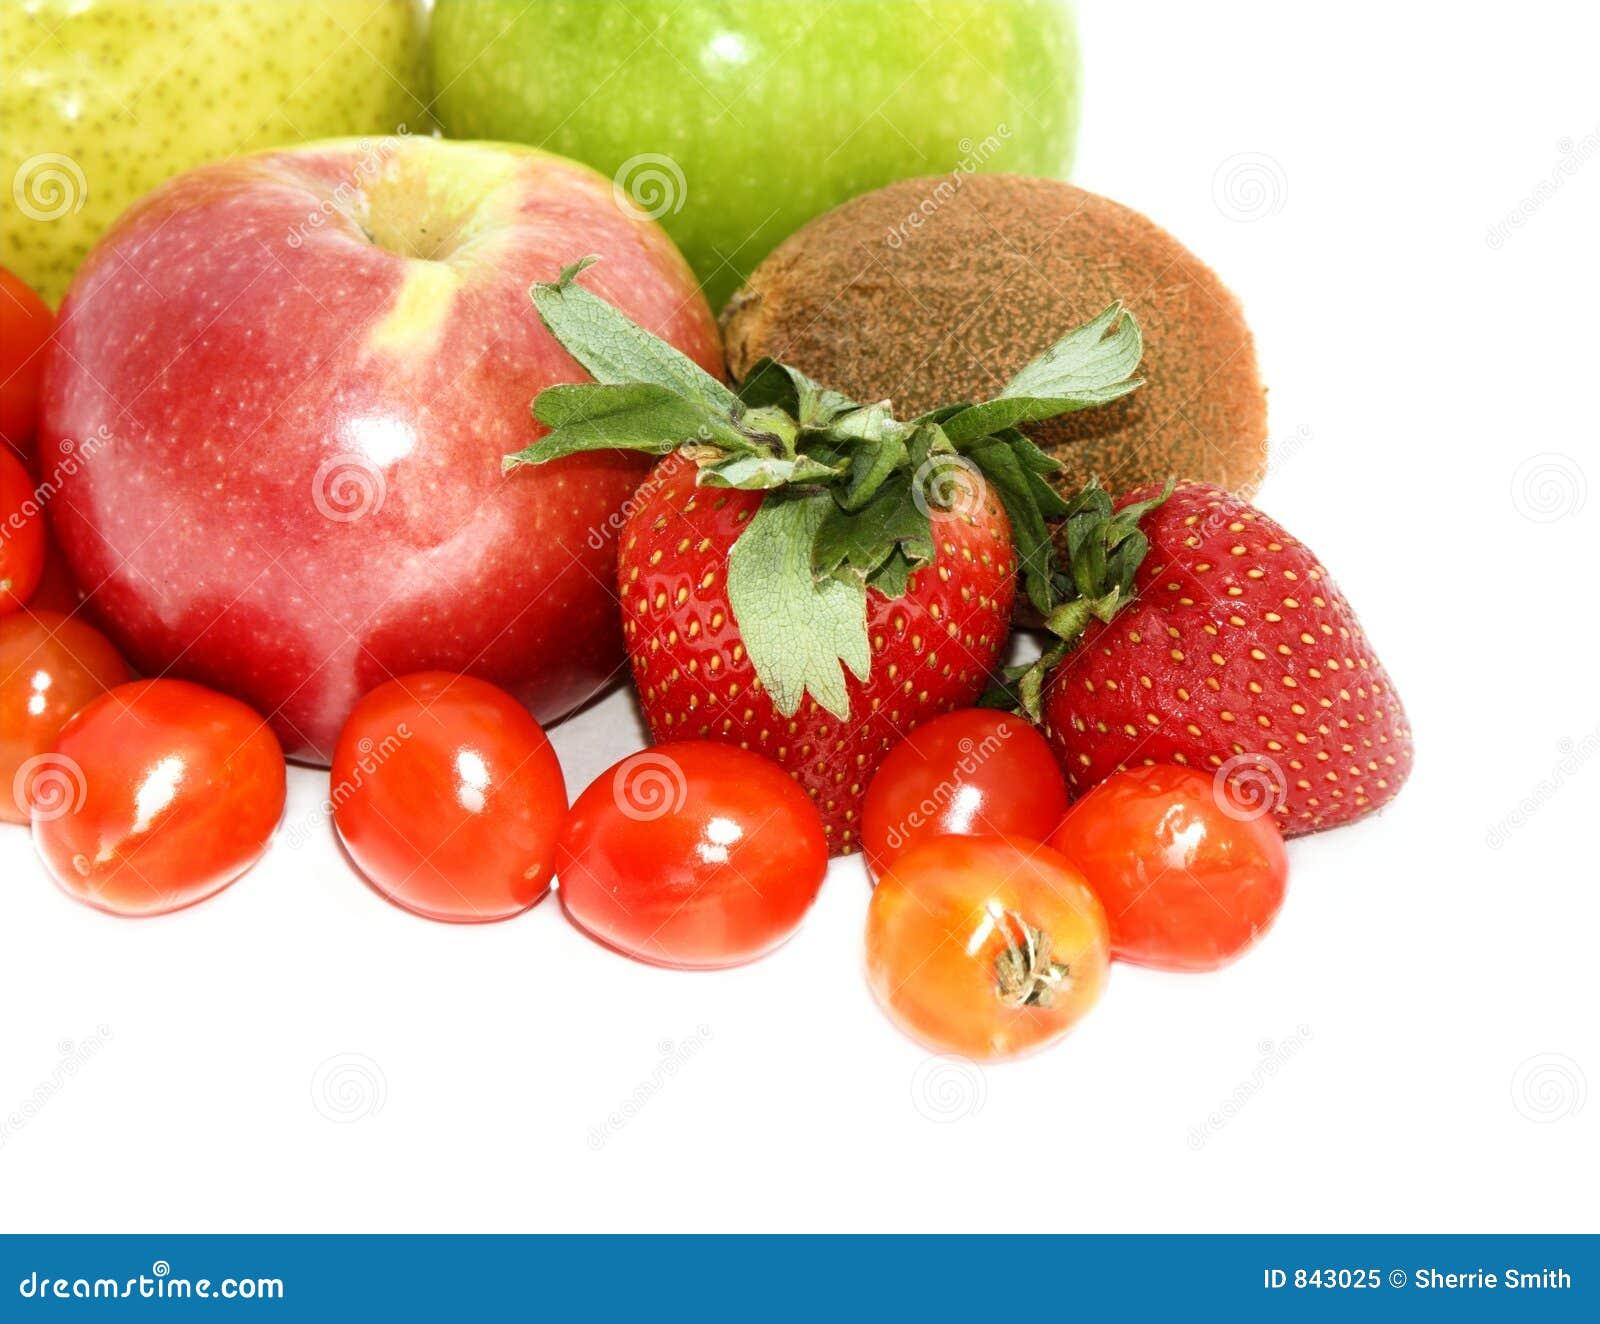 Fruit and veg#2